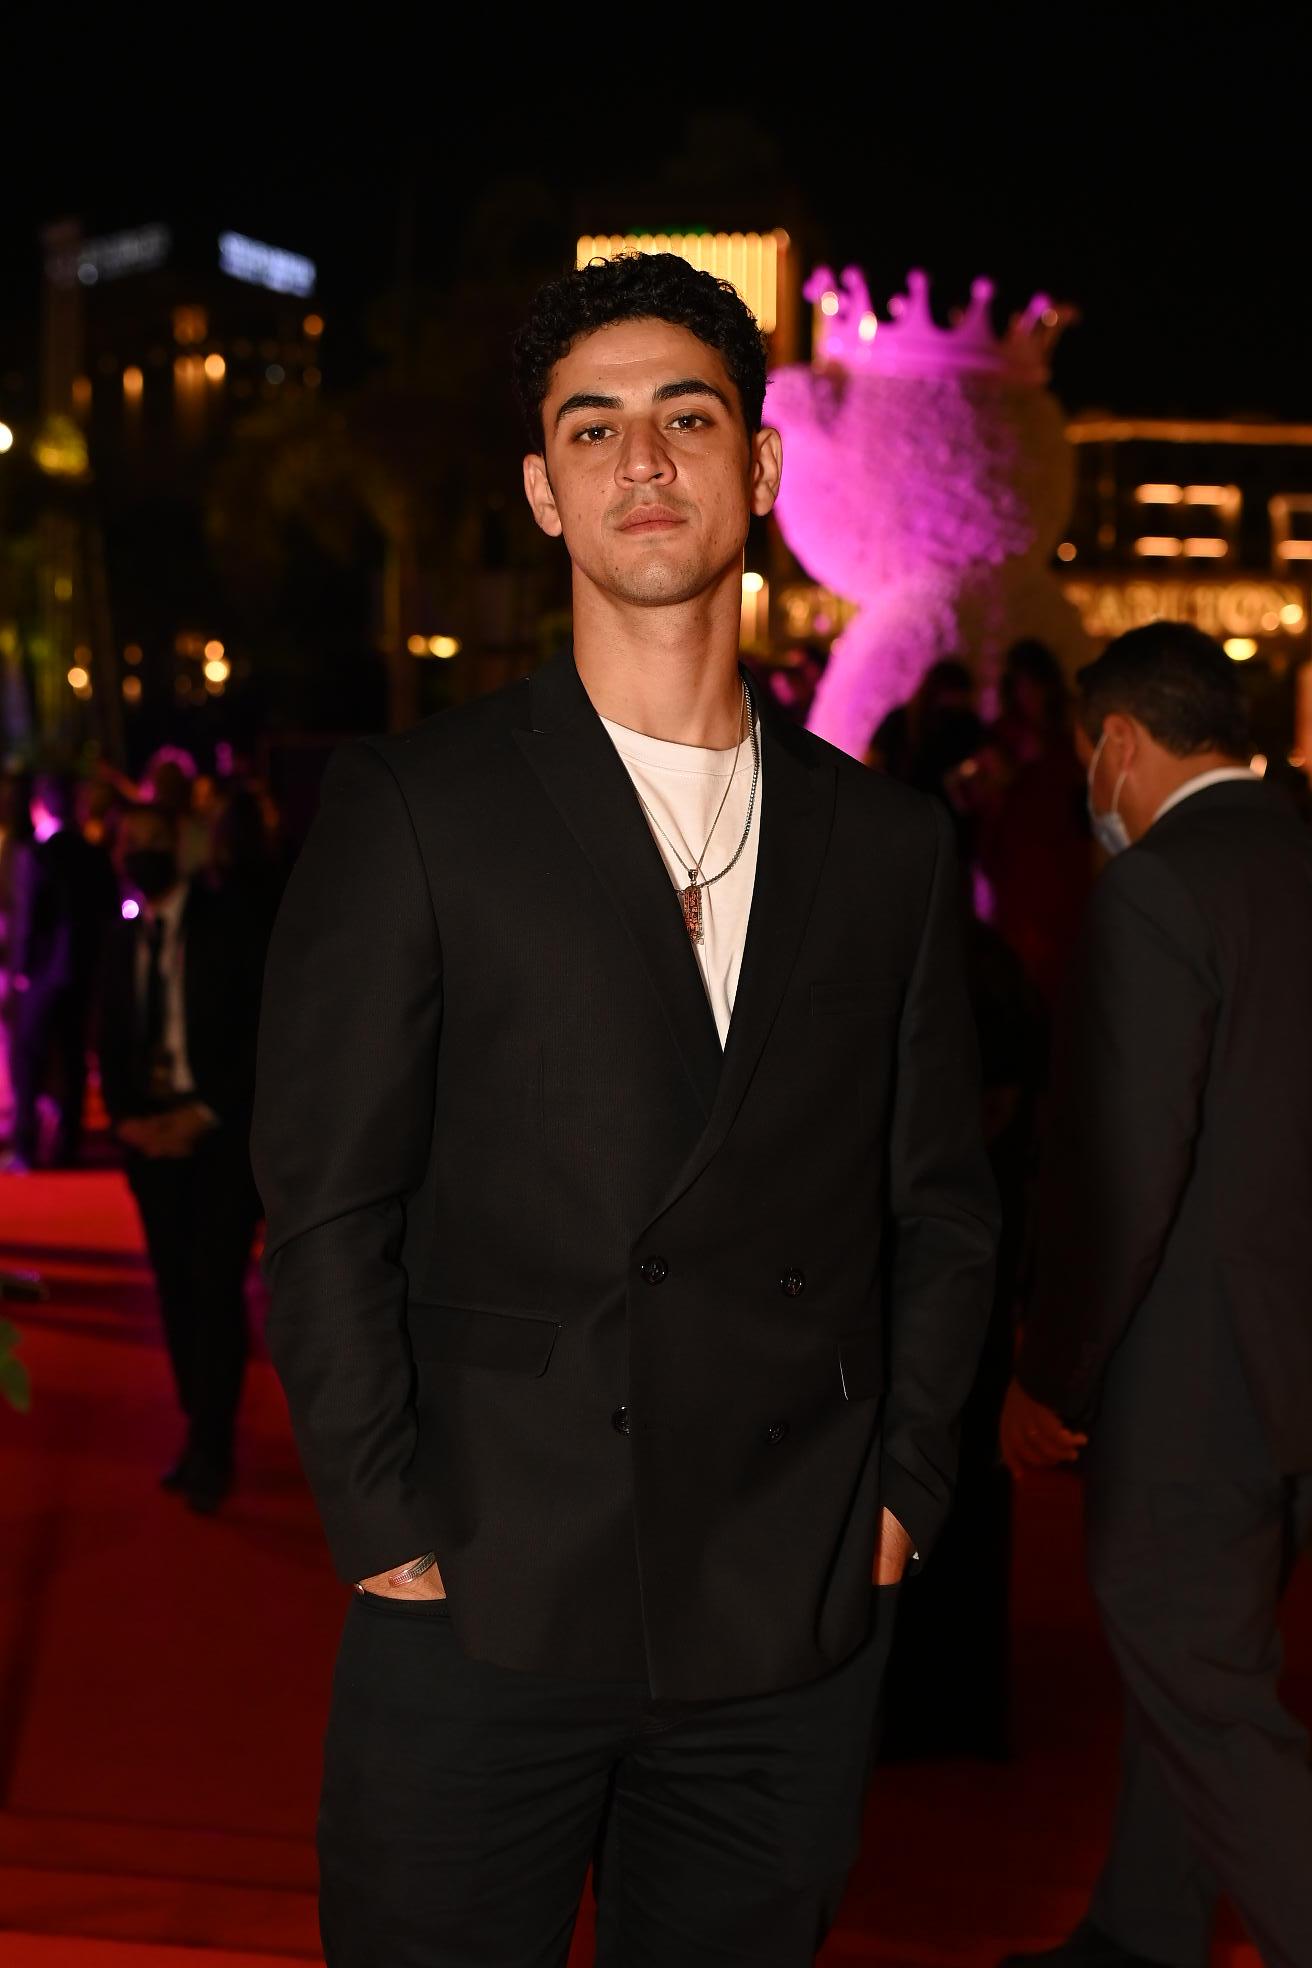 Adam Sharkawy